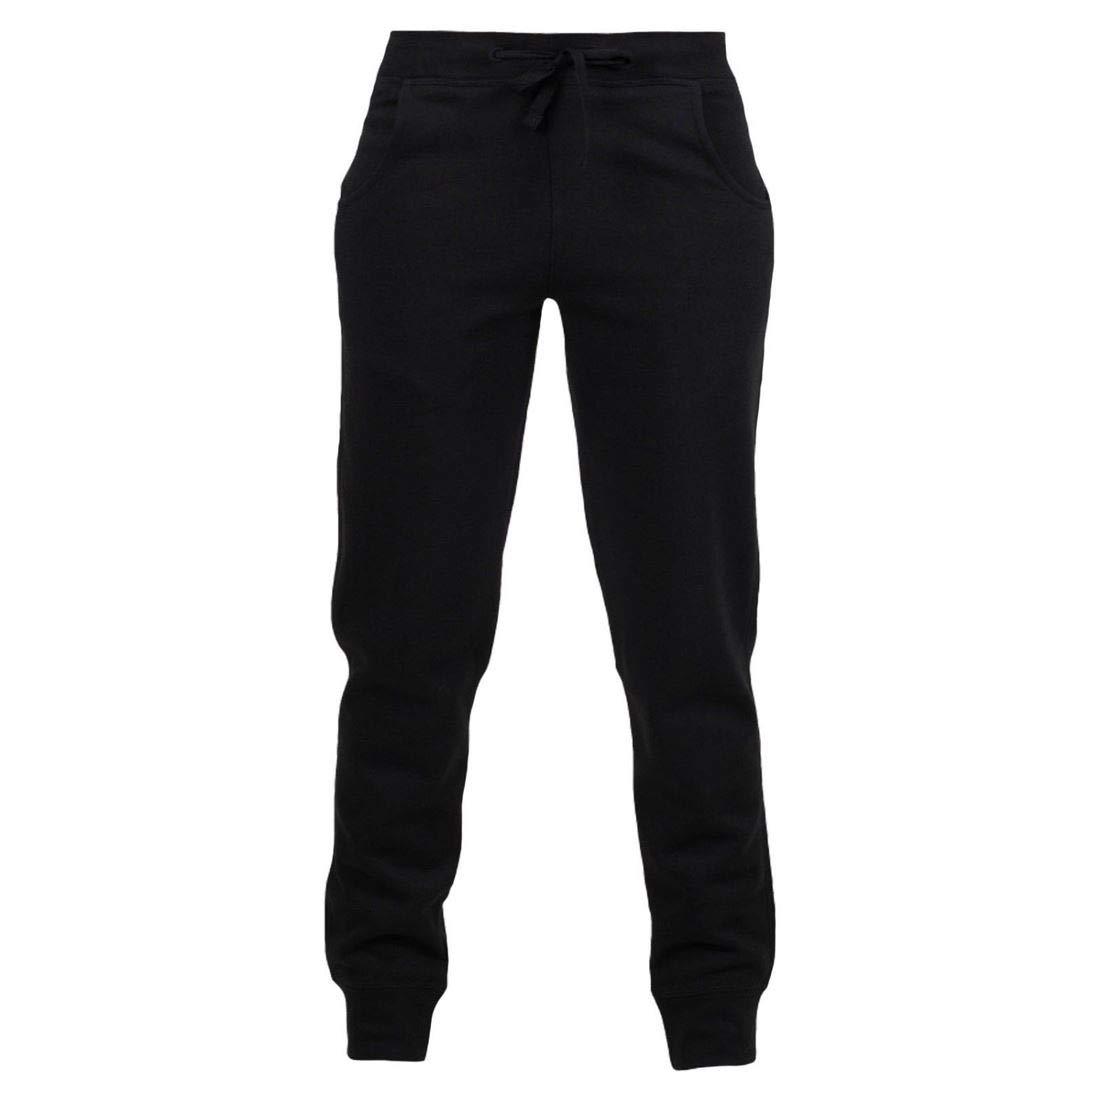 janisramone Kids Boys New Stretchy Slim Fit Jogging Bottom Fleece Children Sweat Sport Trouser Casual Pants